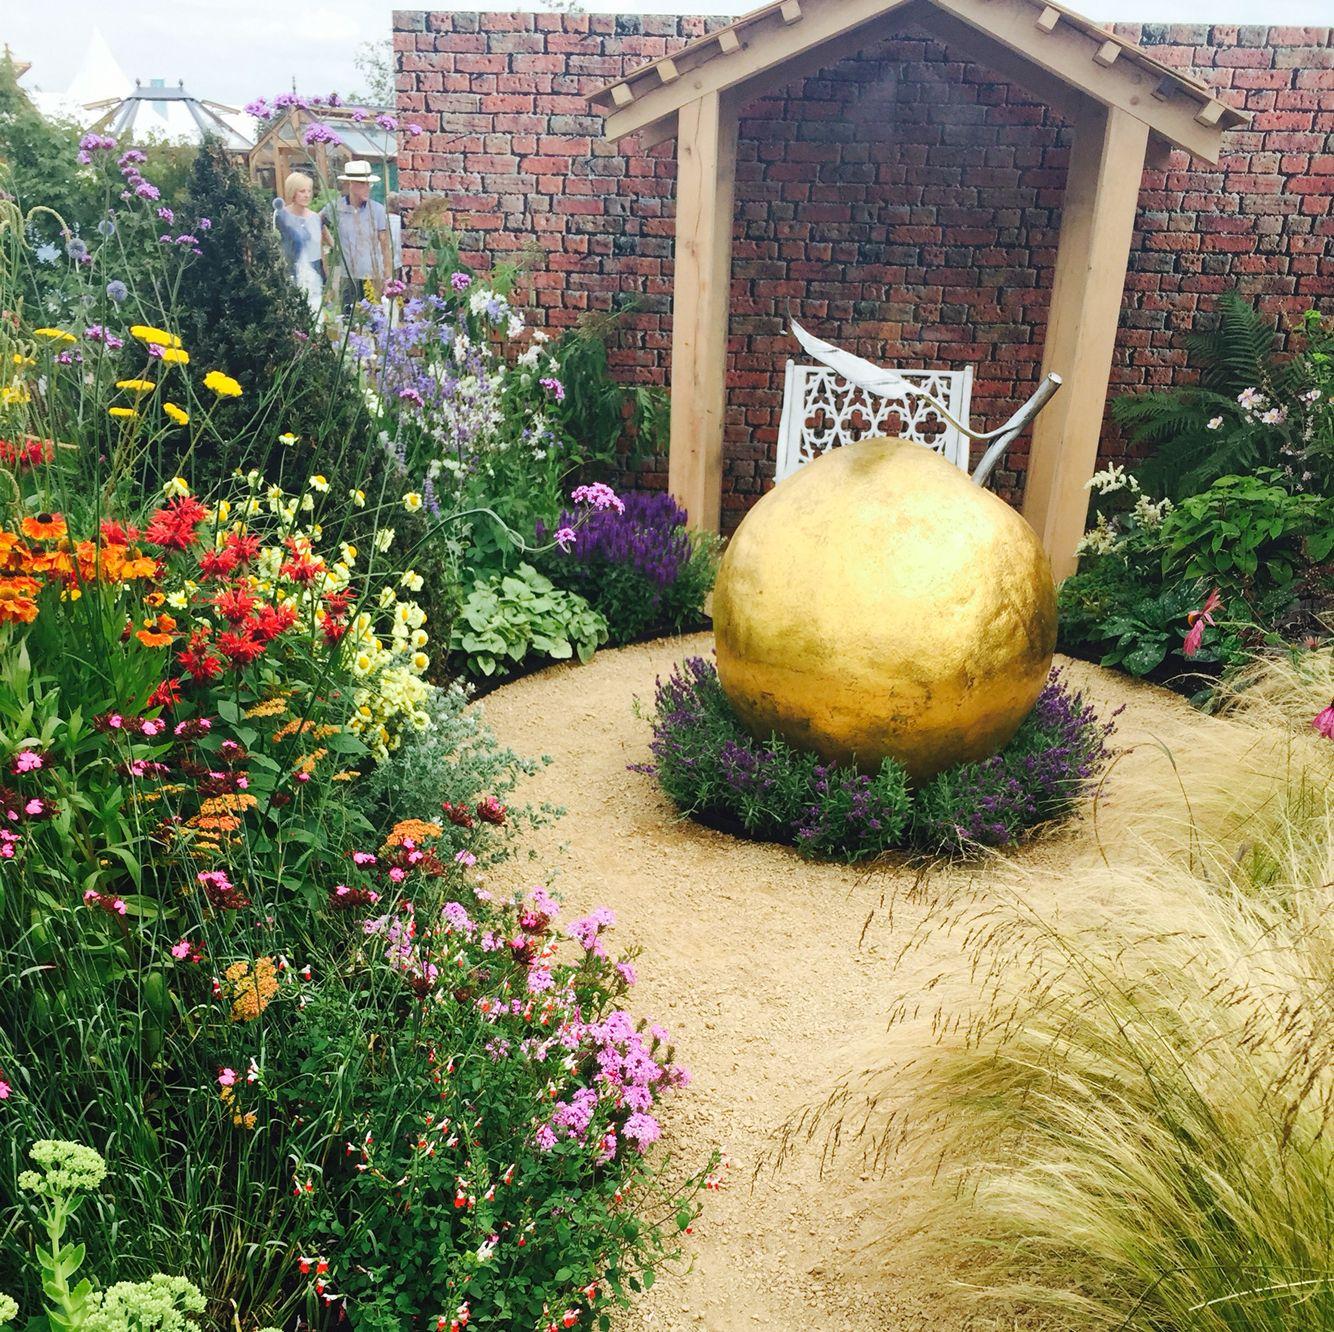 Large gold Apple @ the Tatton Park Flower Show 2016